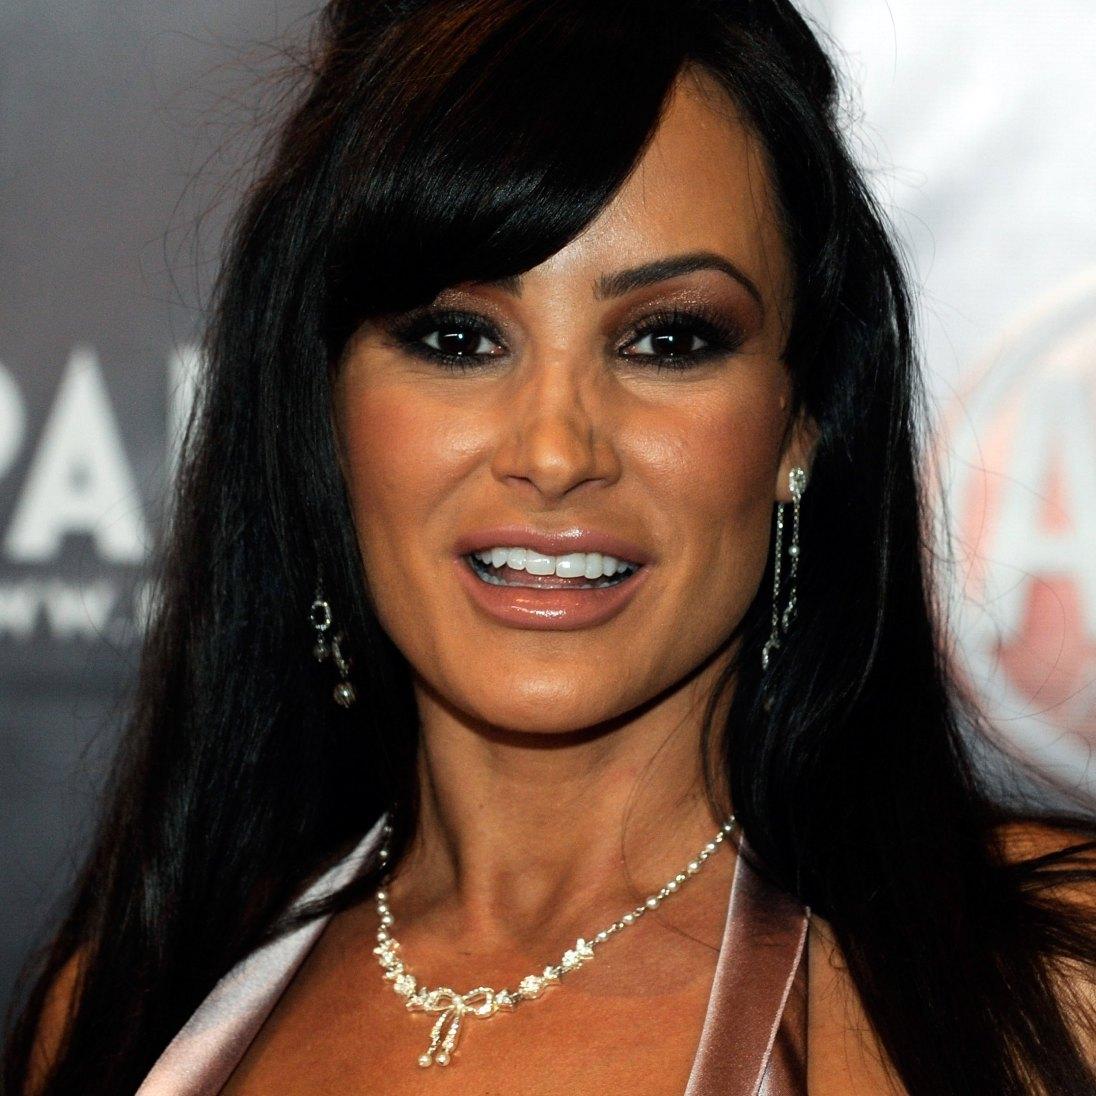 Kush dating adult film actress